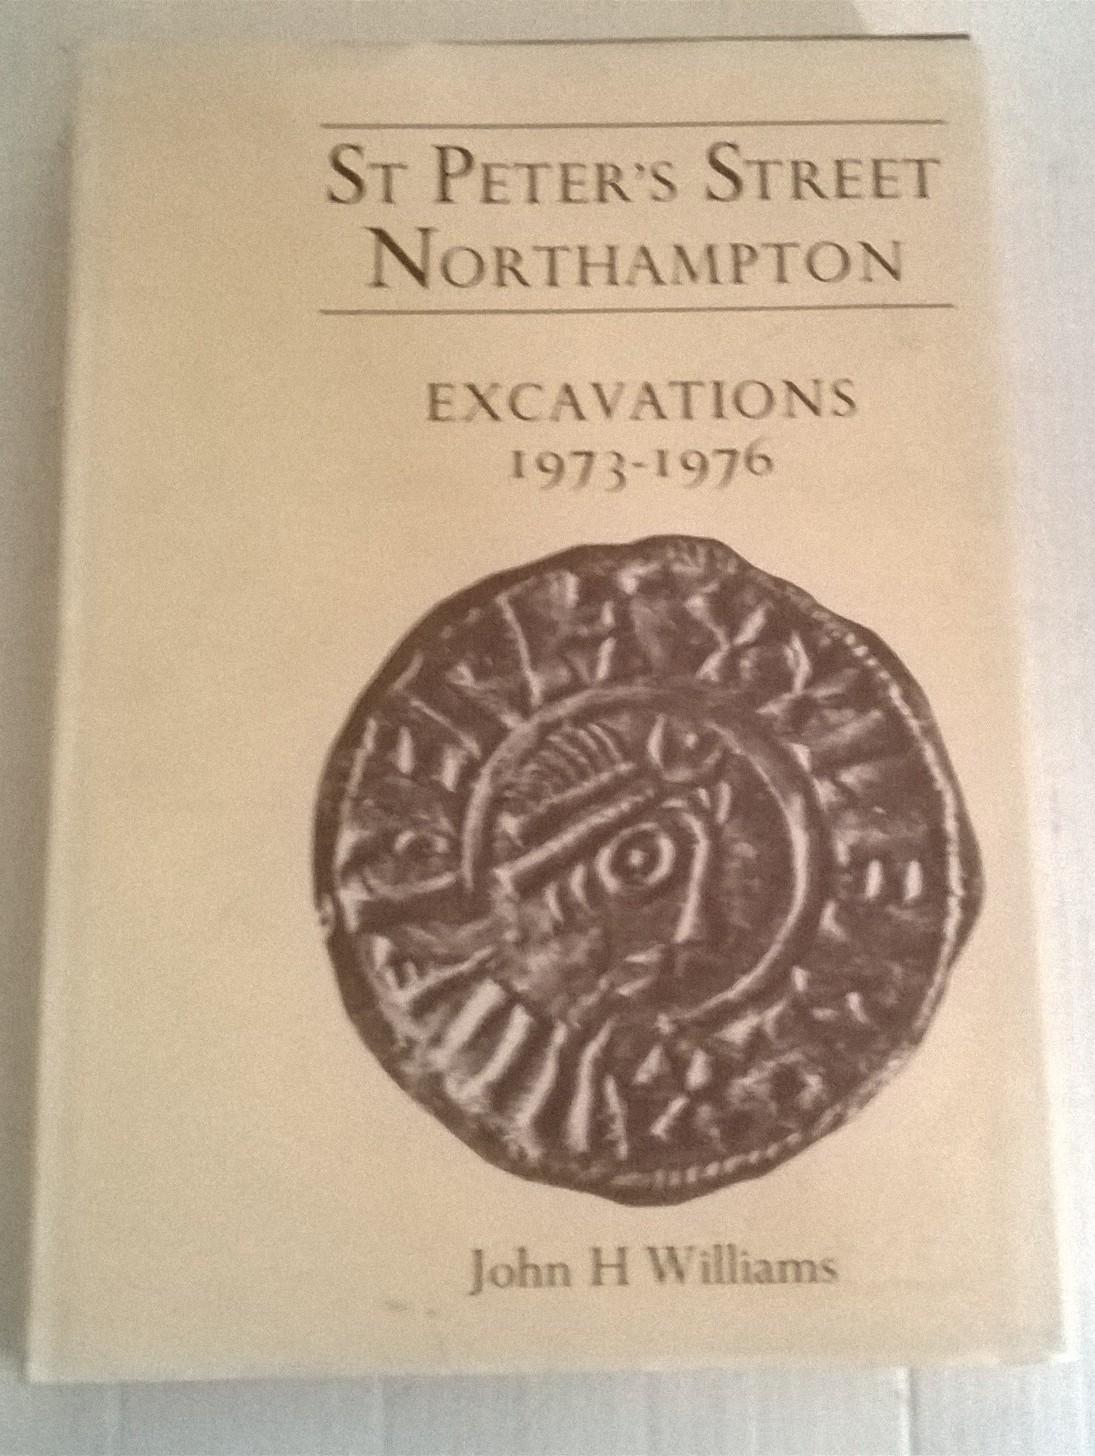 St Peter's Street Northampton :Excavations 1973-1976, Williams, John H ;